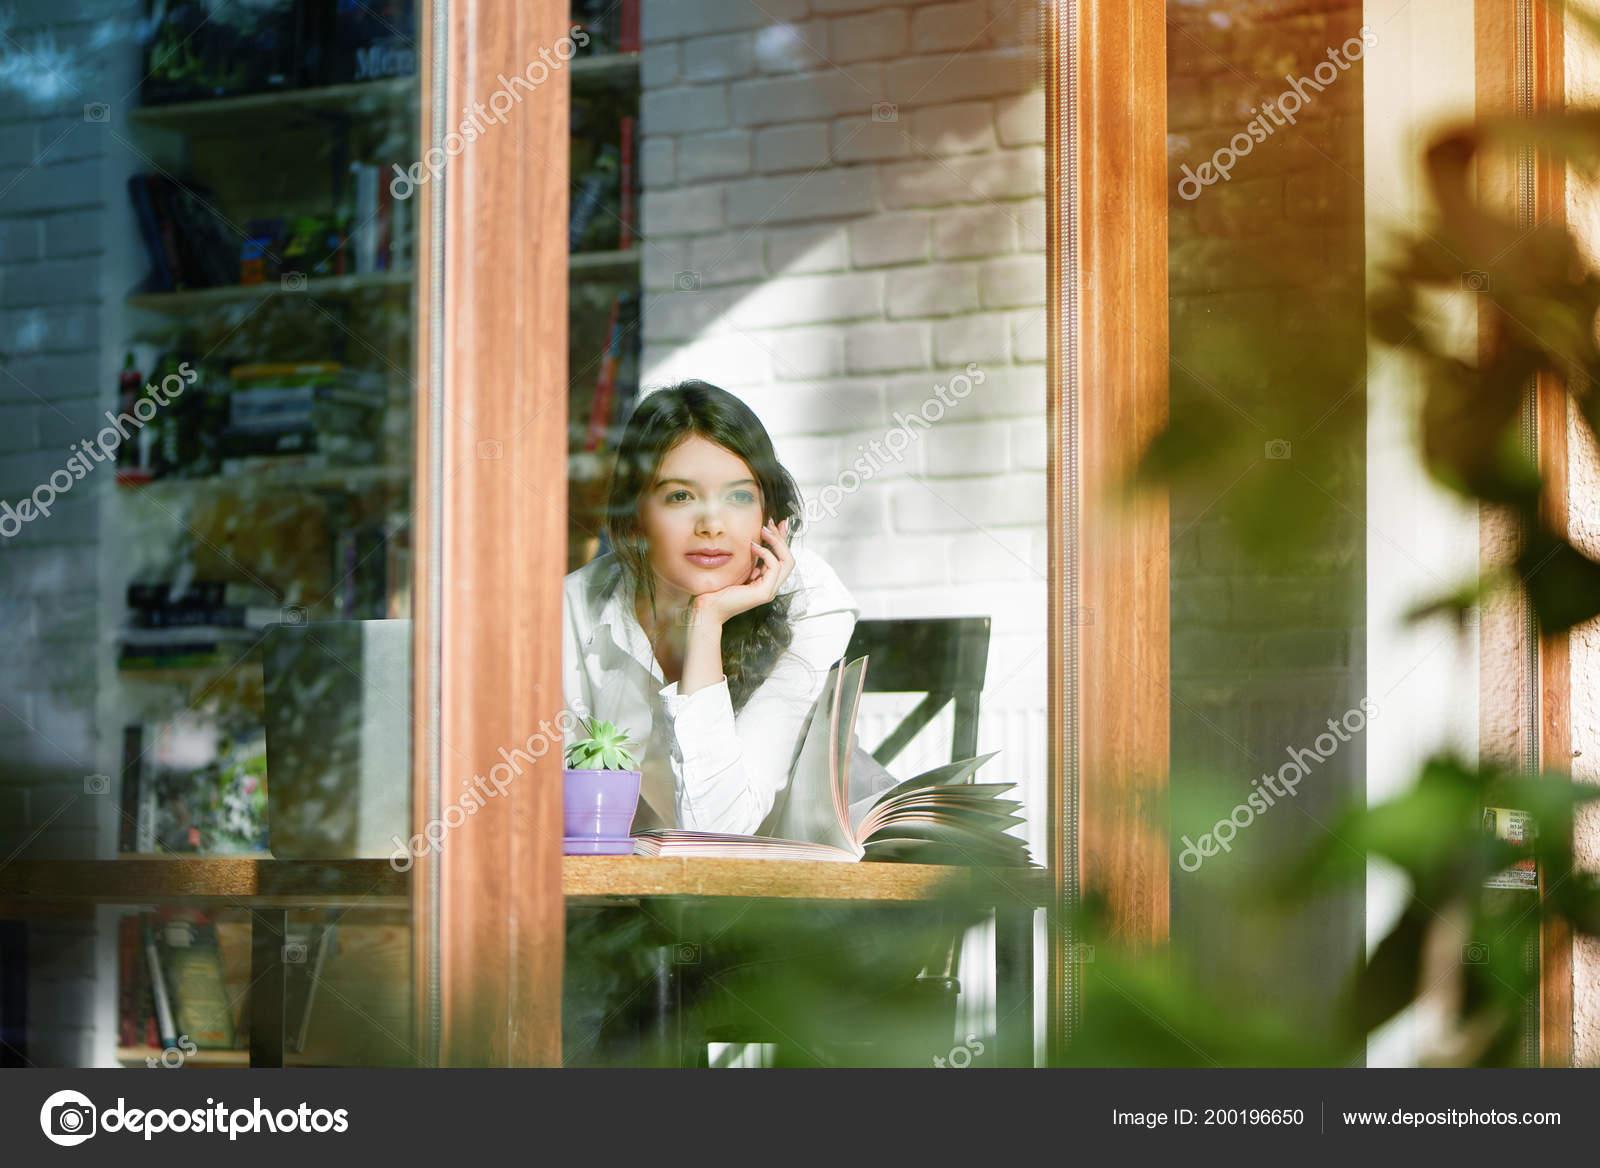 Horizontal Photo Of Girl Looking Outside Throw Window Glass Stock